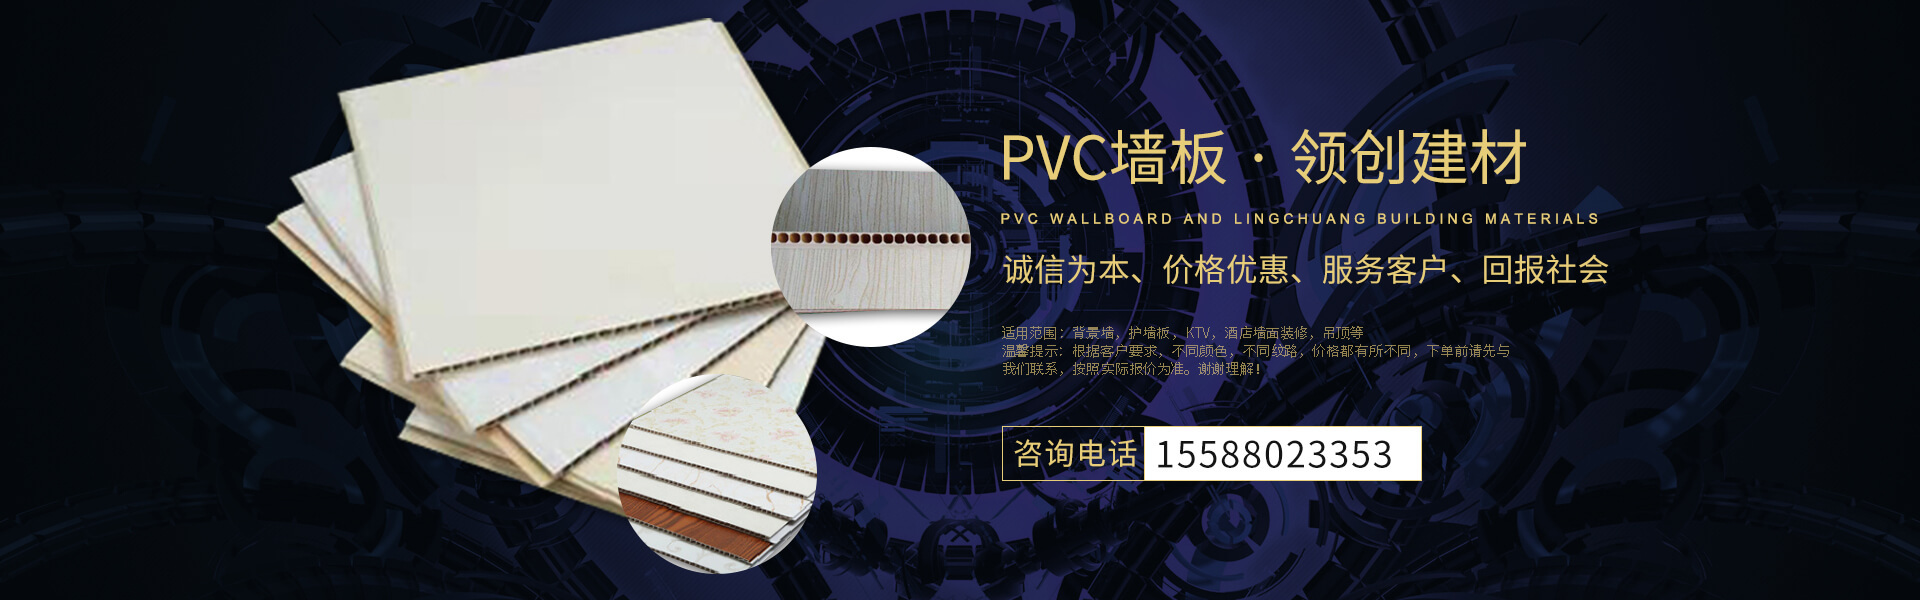 pvc扣板生产厂家,专业pvc墙板厂家,专业pvc扣板厂家,山东pvc墙板厂家